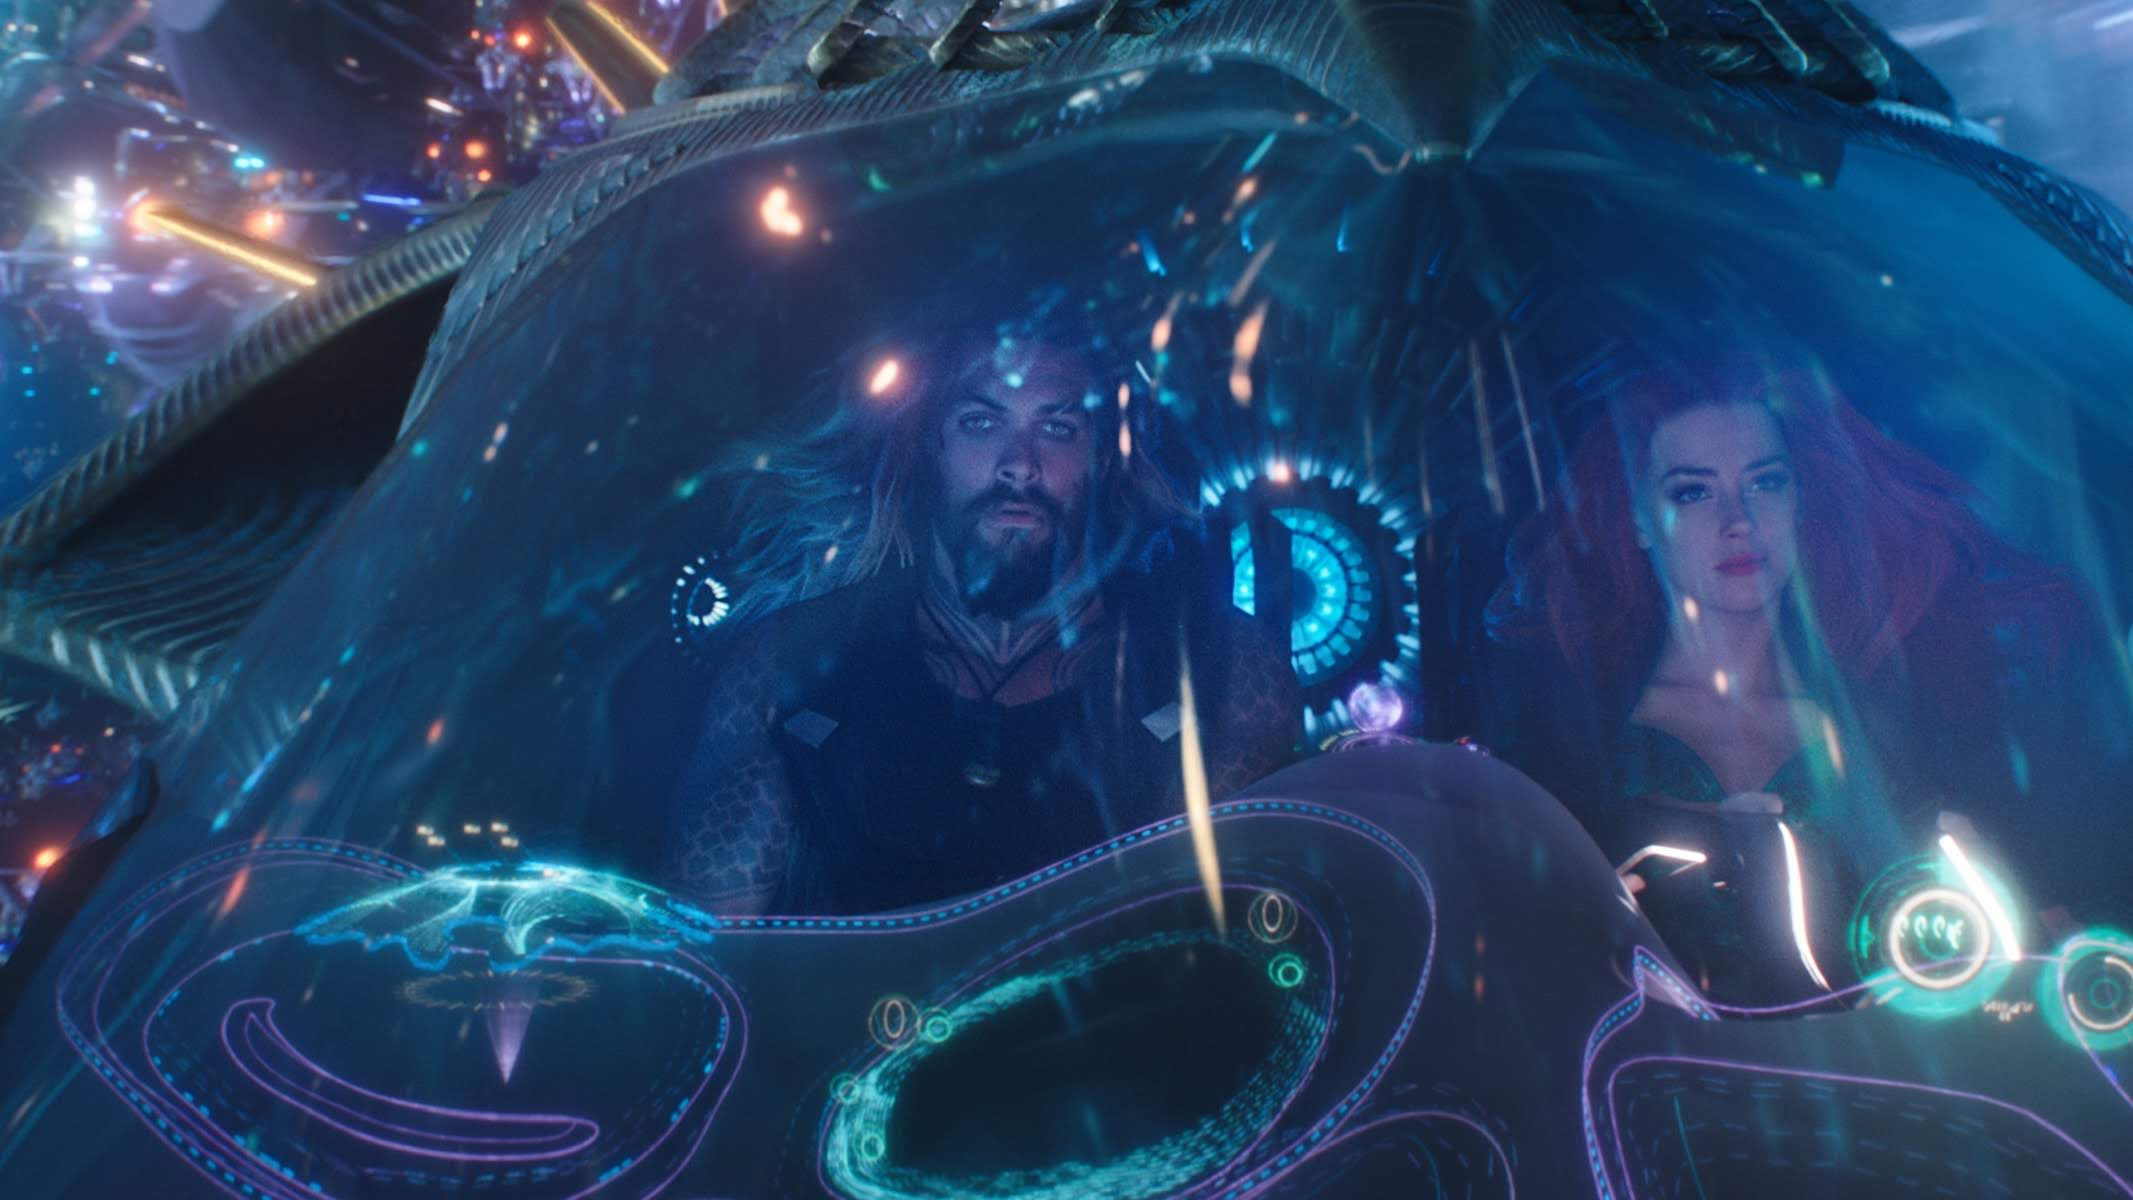 Aquaman : DCユニバース史上最大ヒットを記録した海の王者の「アクアマン」の VFX を紹介したビフォー・アフター・ビデオの2本立て ! !